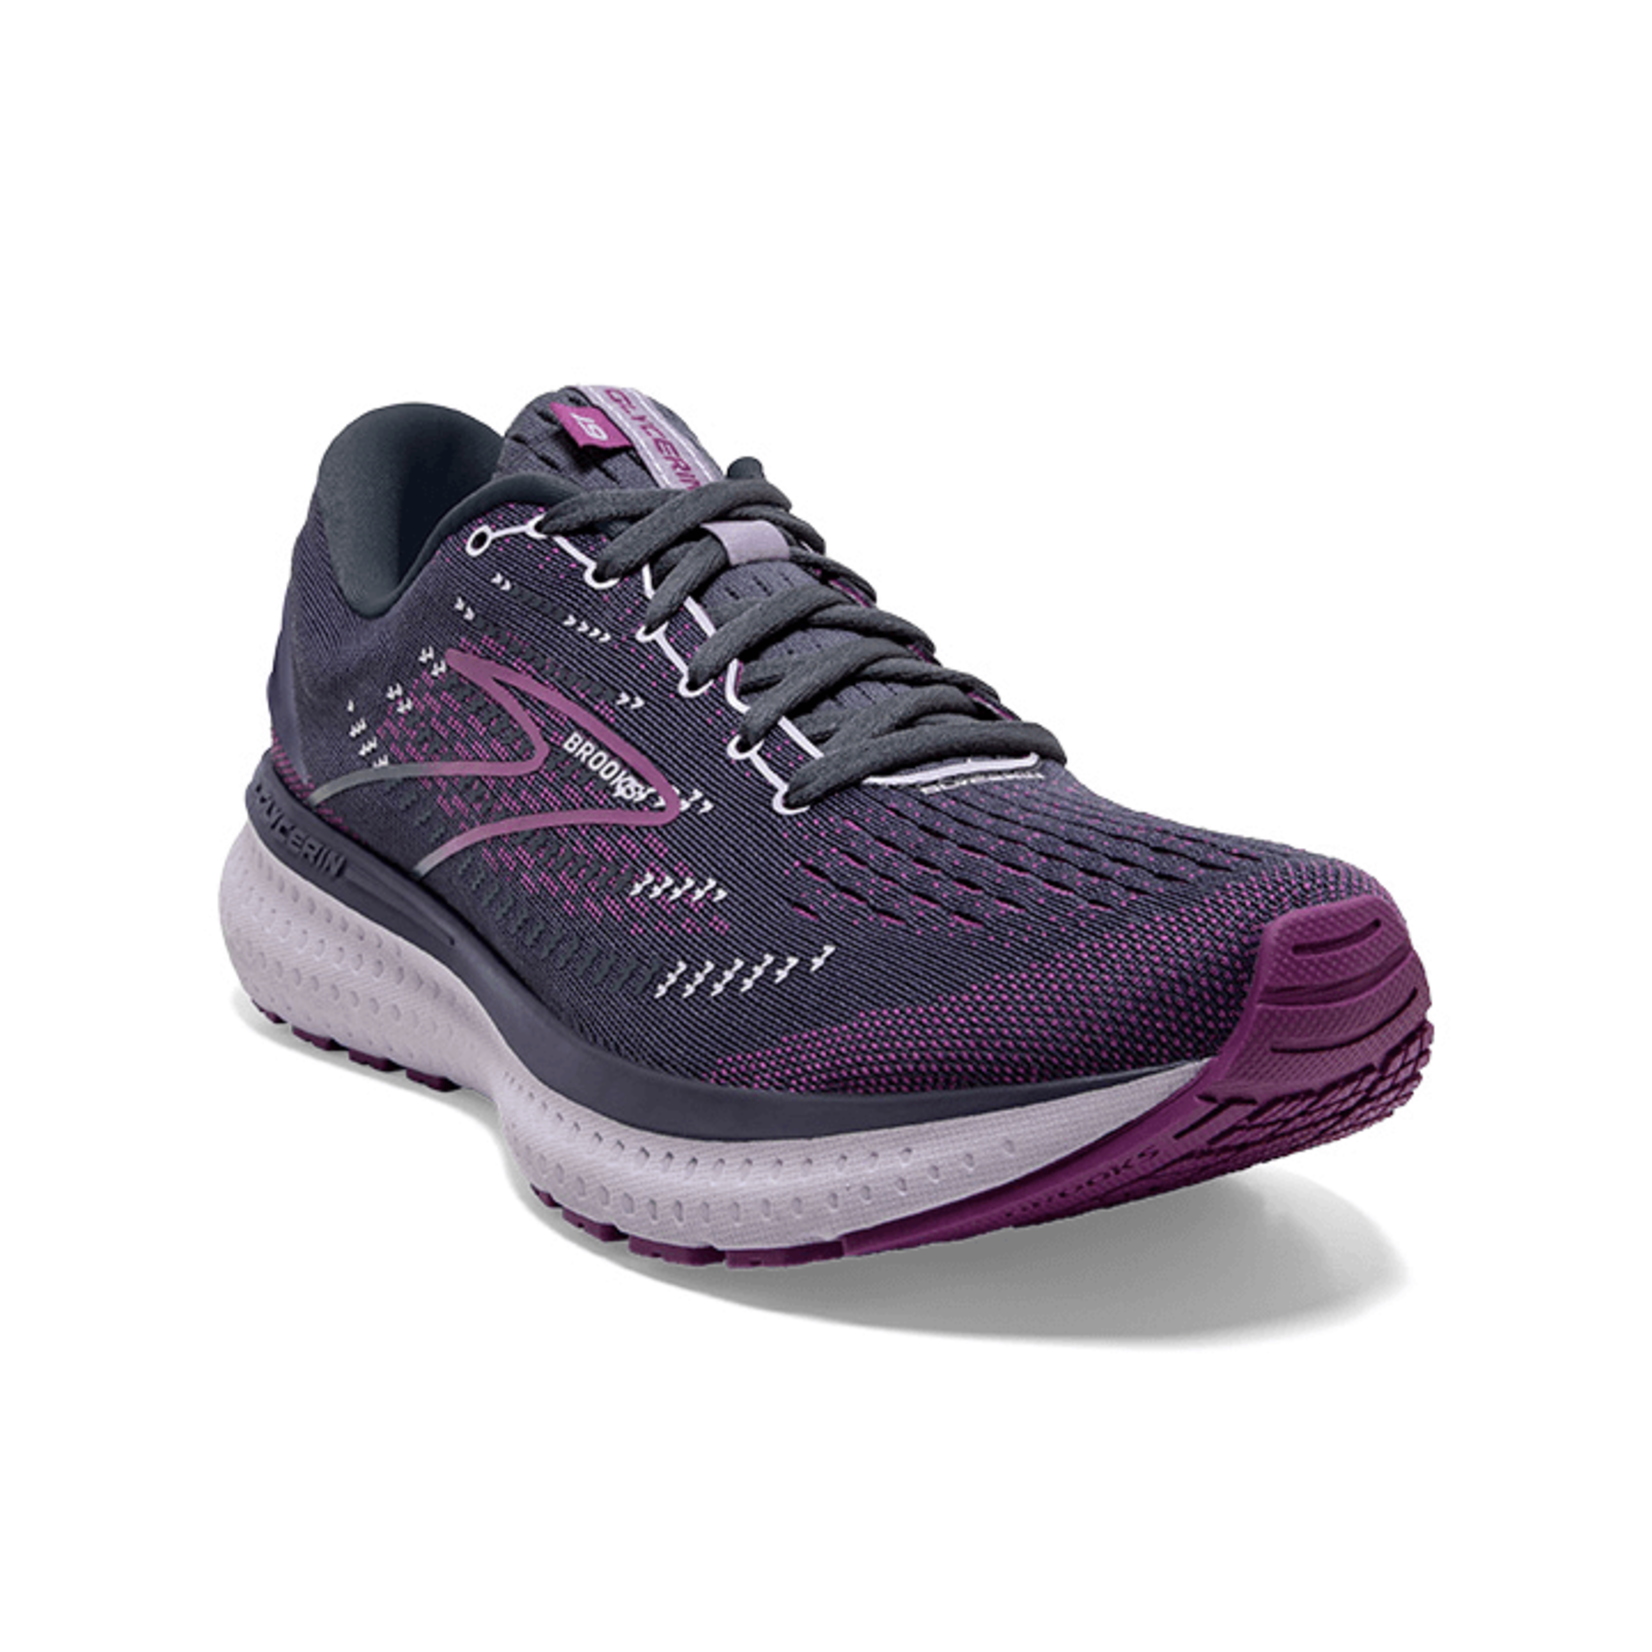 Brooks Brooks Running Shoes, Glycerin 19, Ladies